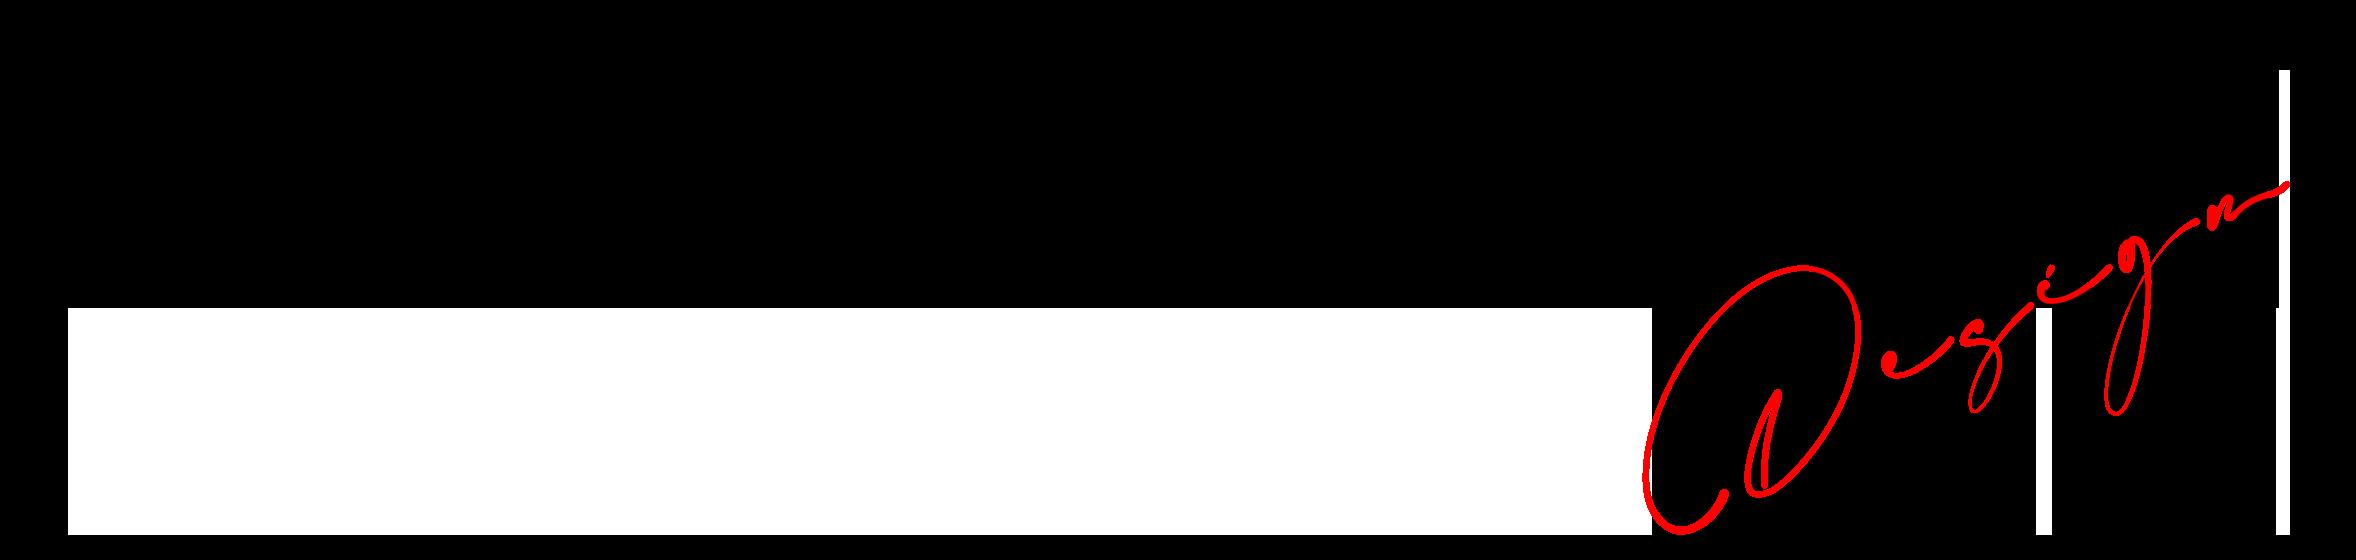 TasysDesign